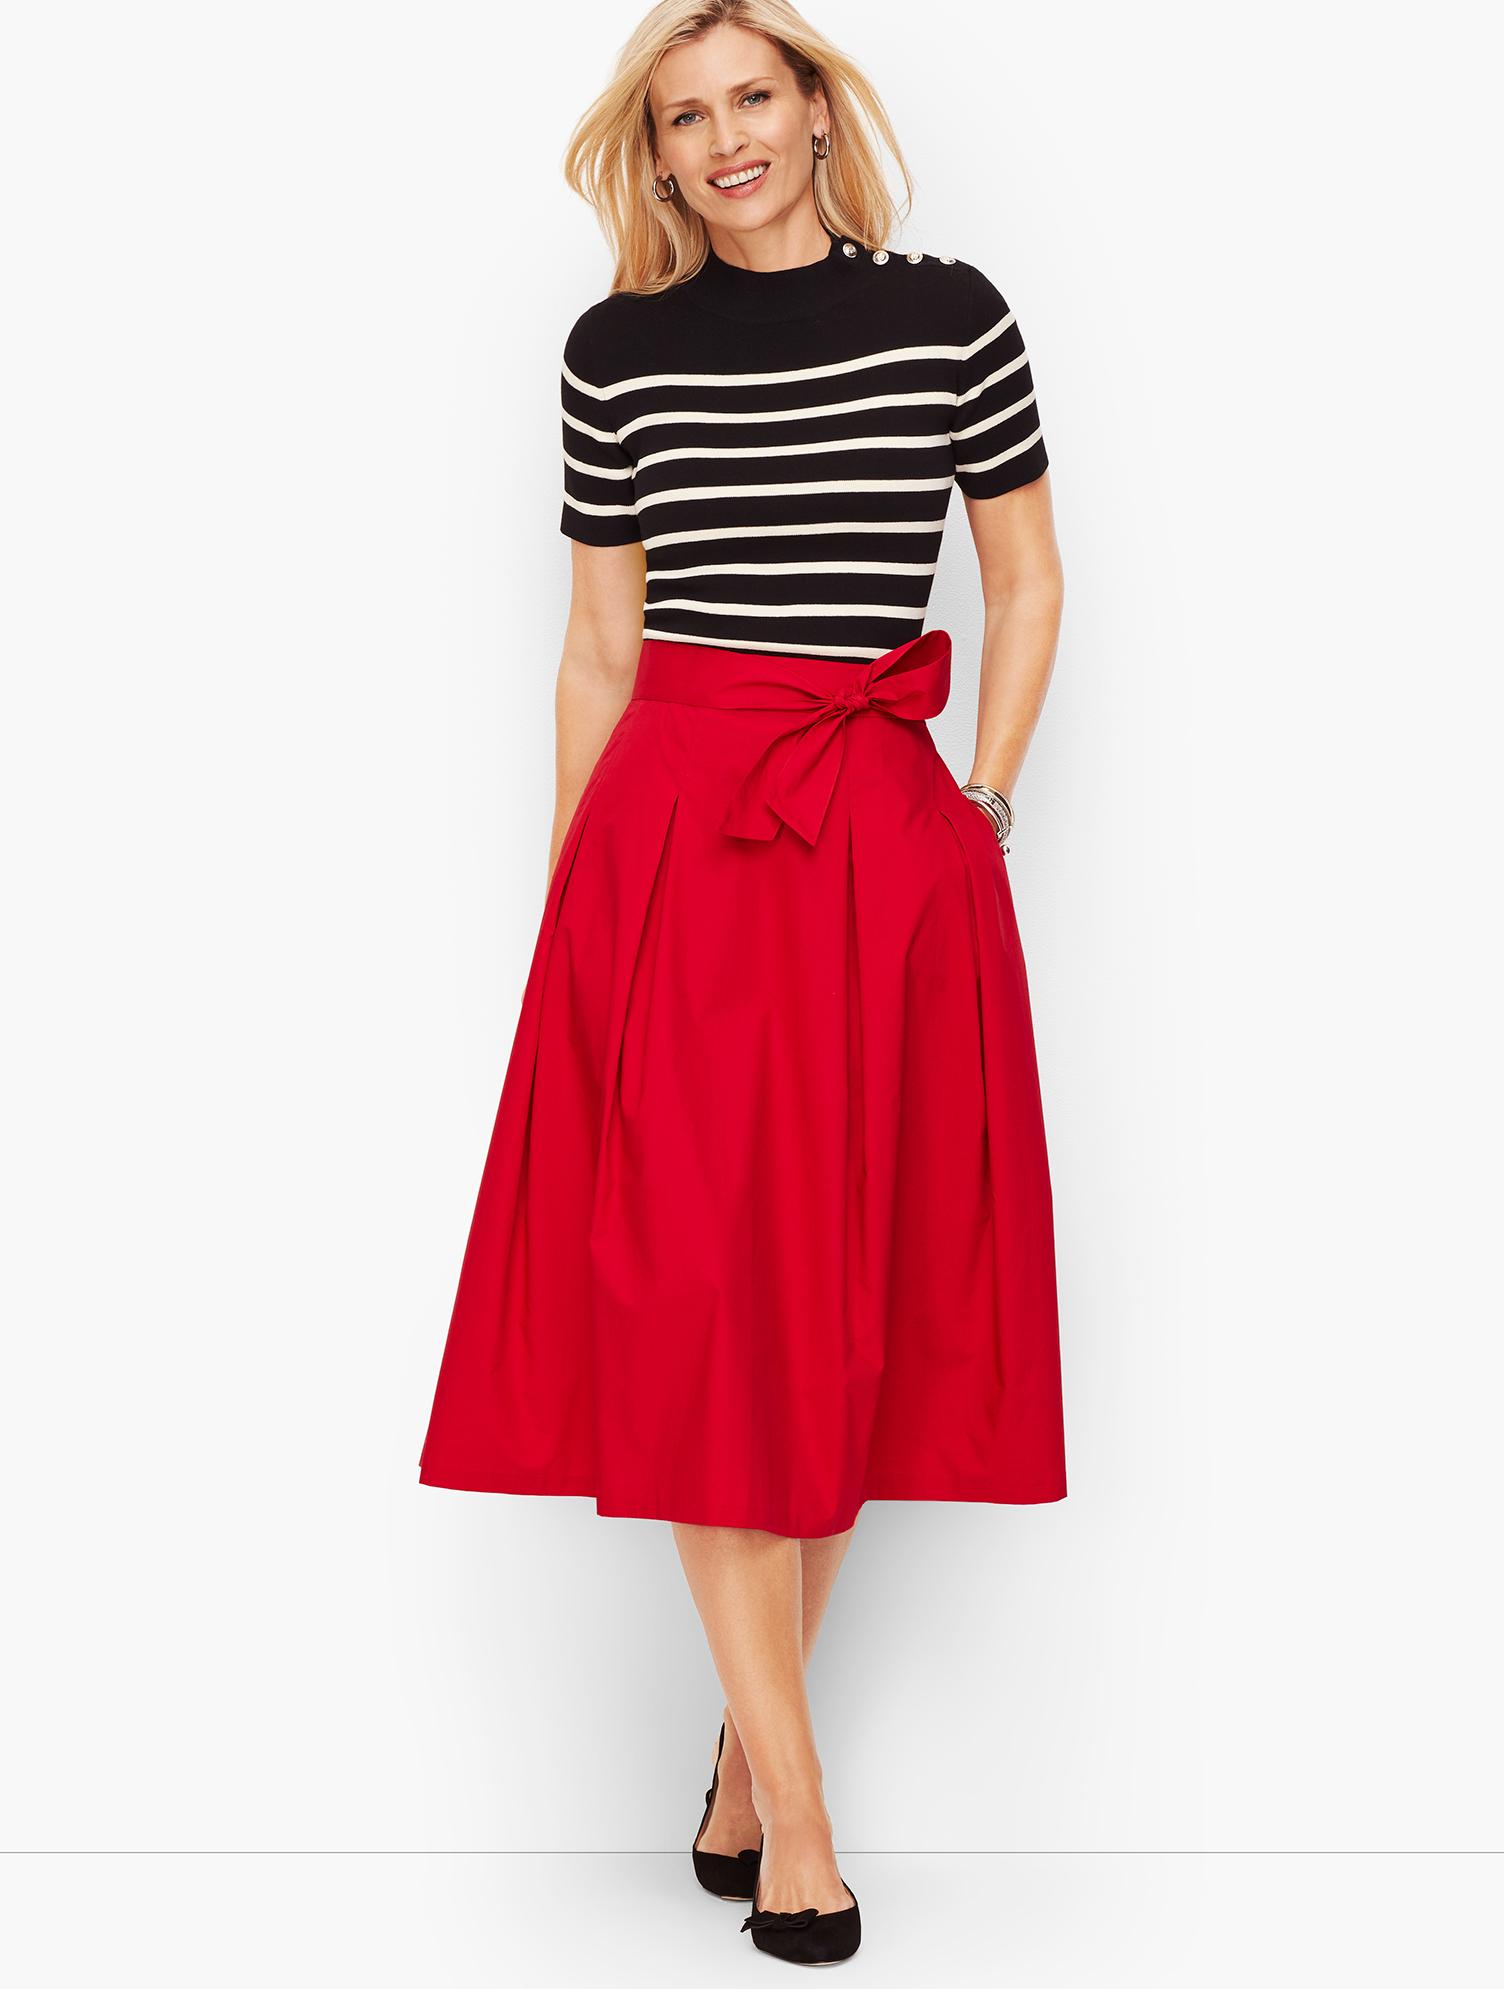 60s Skirts | 70s Hippie Skirts, Jumper Dresses Poplin Full Skirt - RED-POP - 16 - Talbots $44.99 AT vintagedancer.com